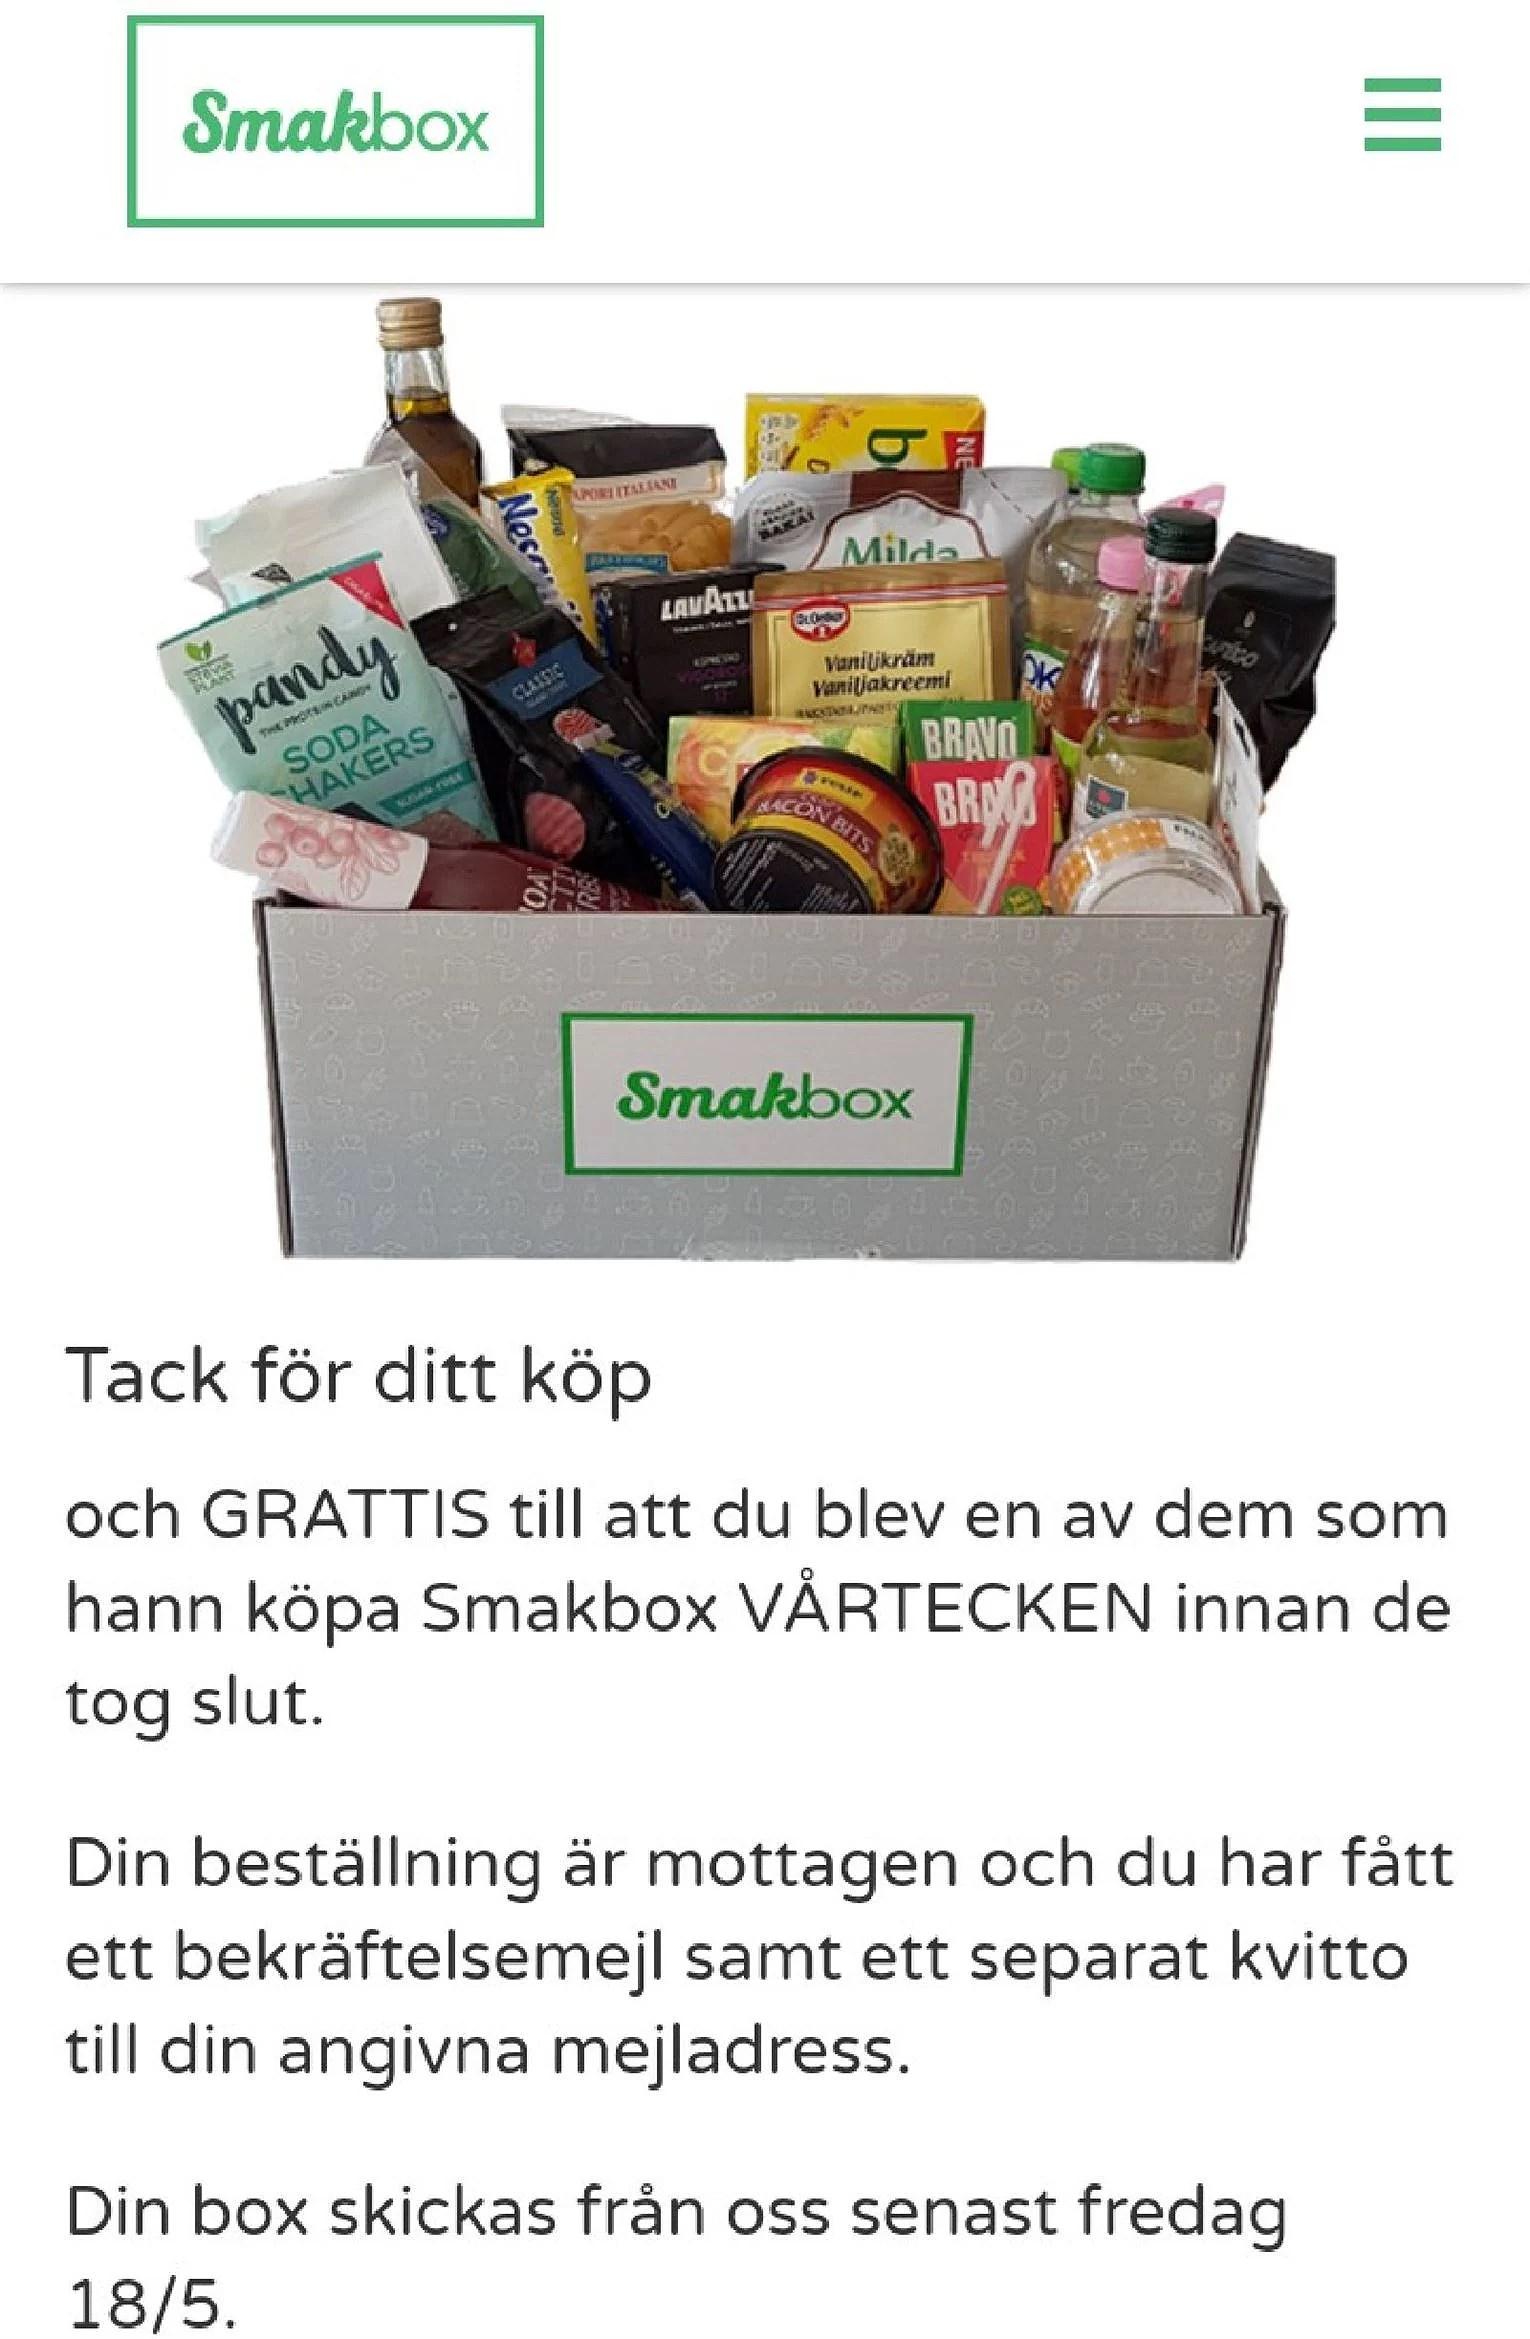 Favoritboxen smakbox